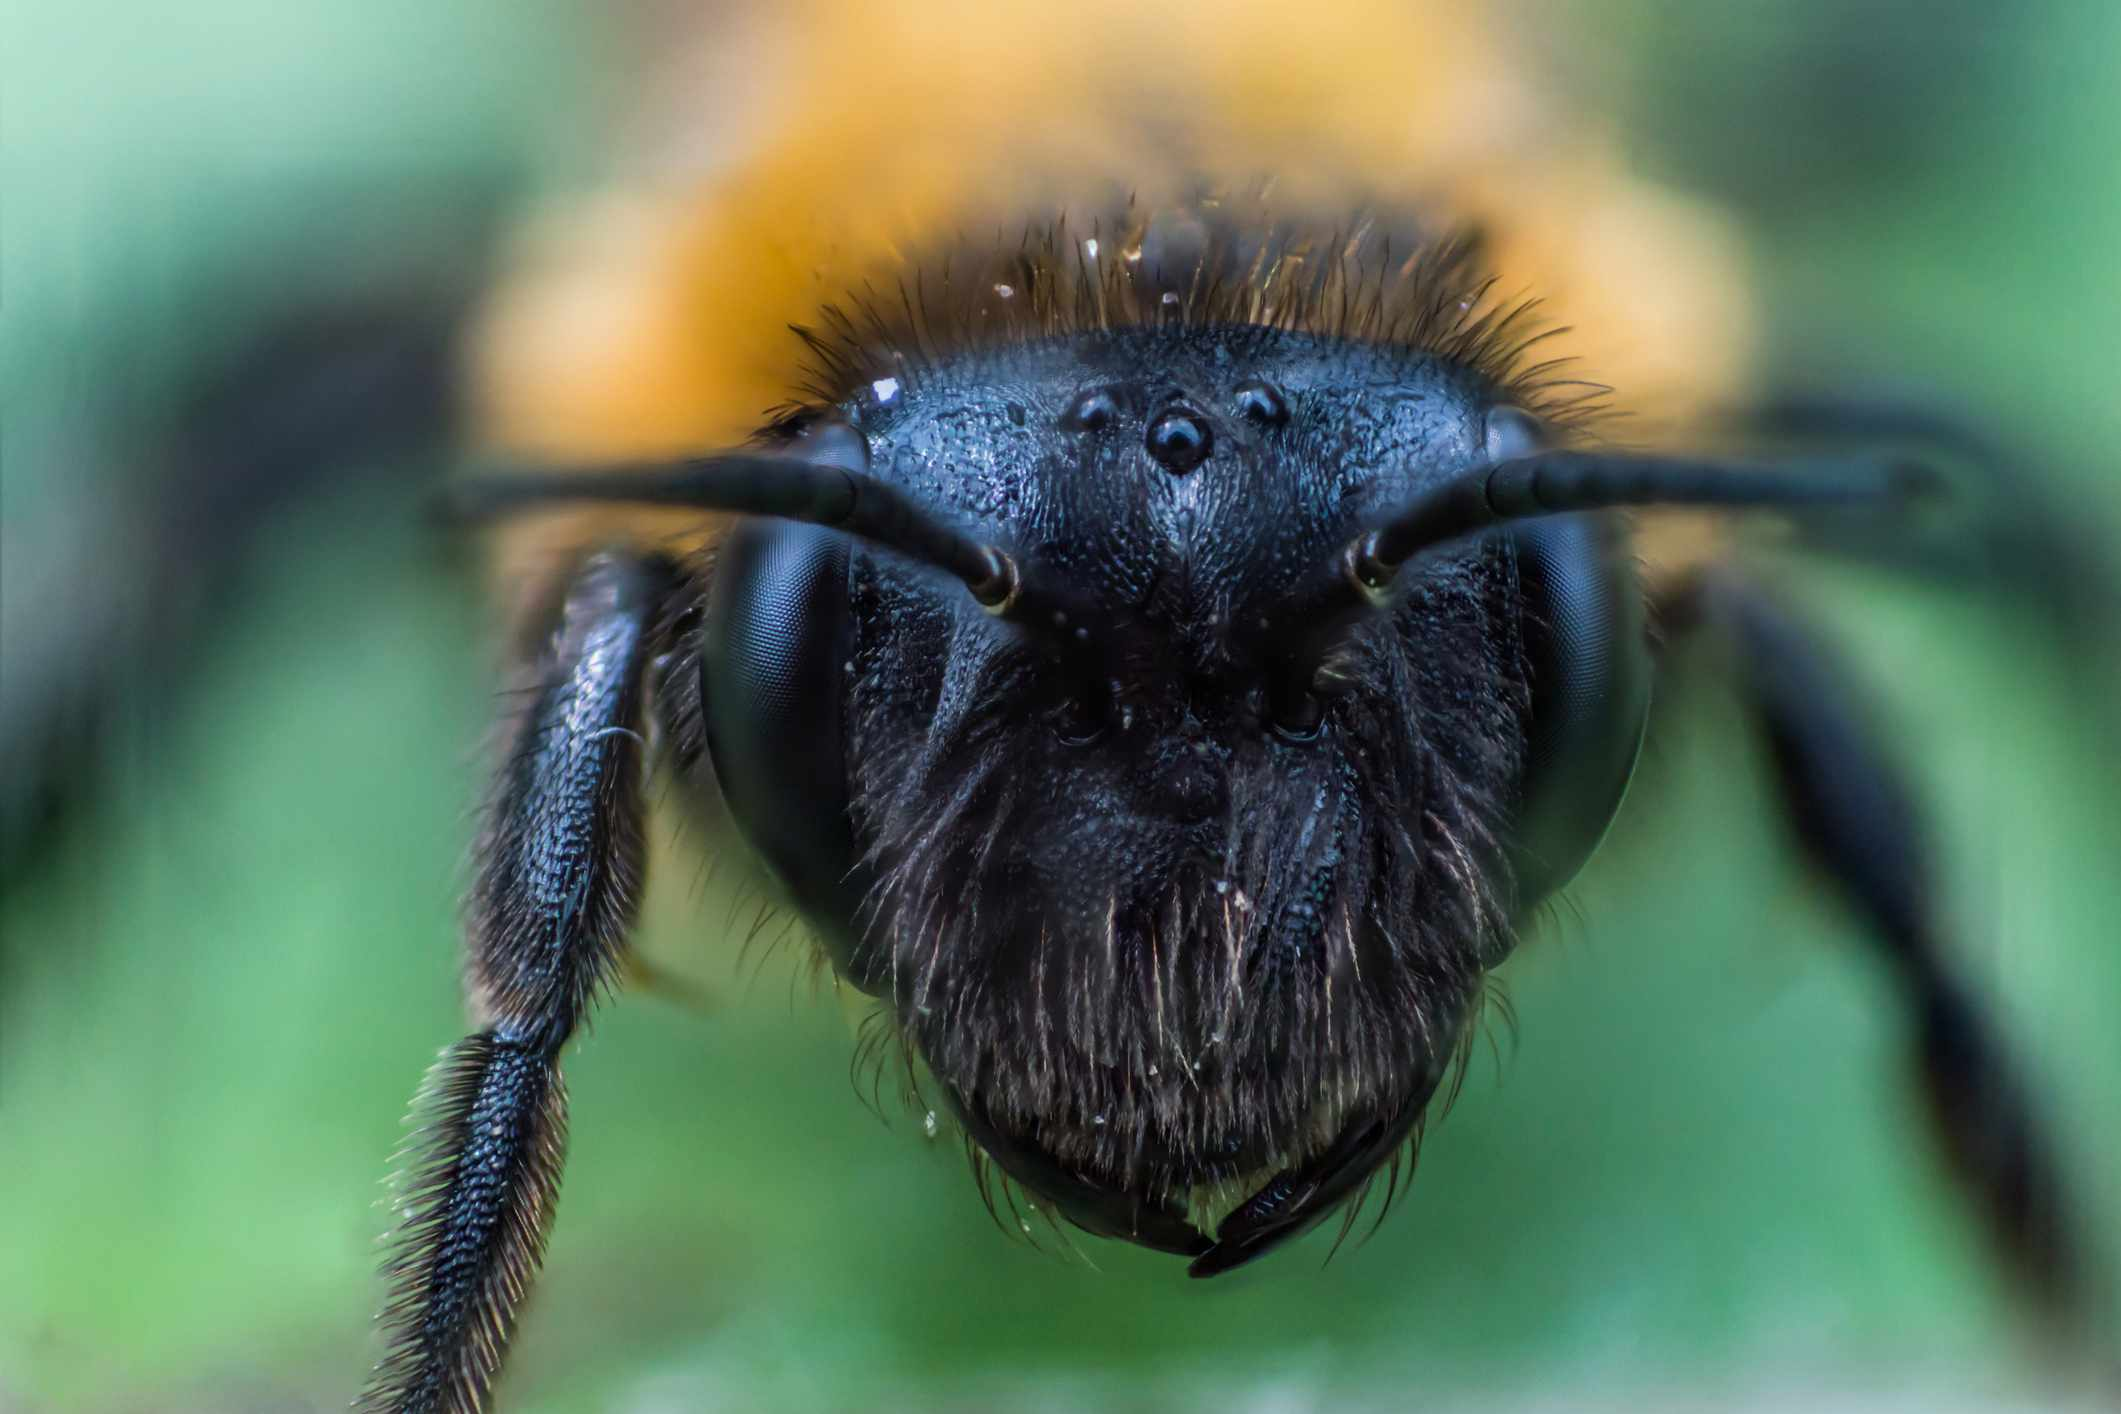 Close up of bumblebee eyes